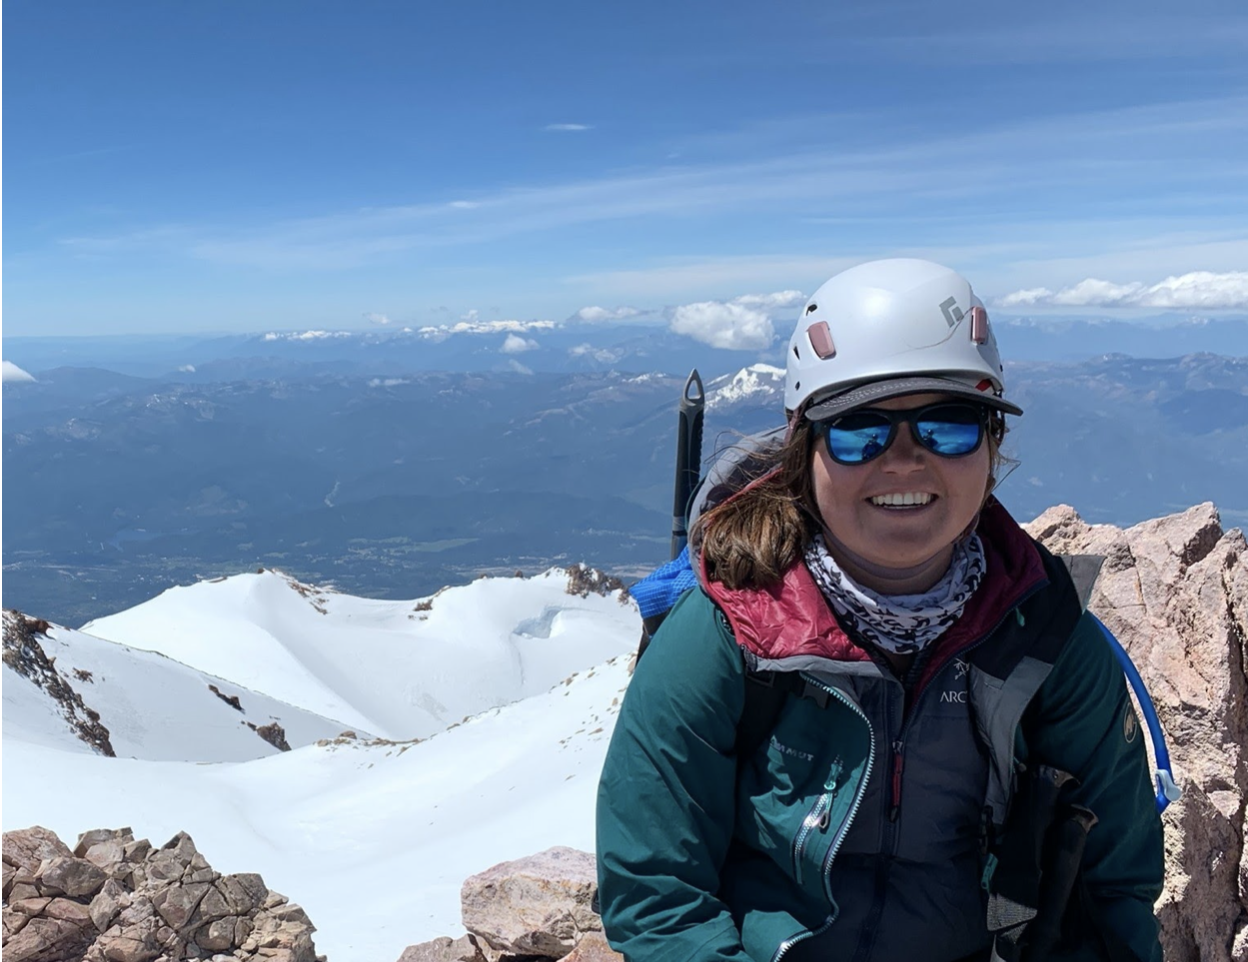 Ashley on the Mount Shasta Summit!